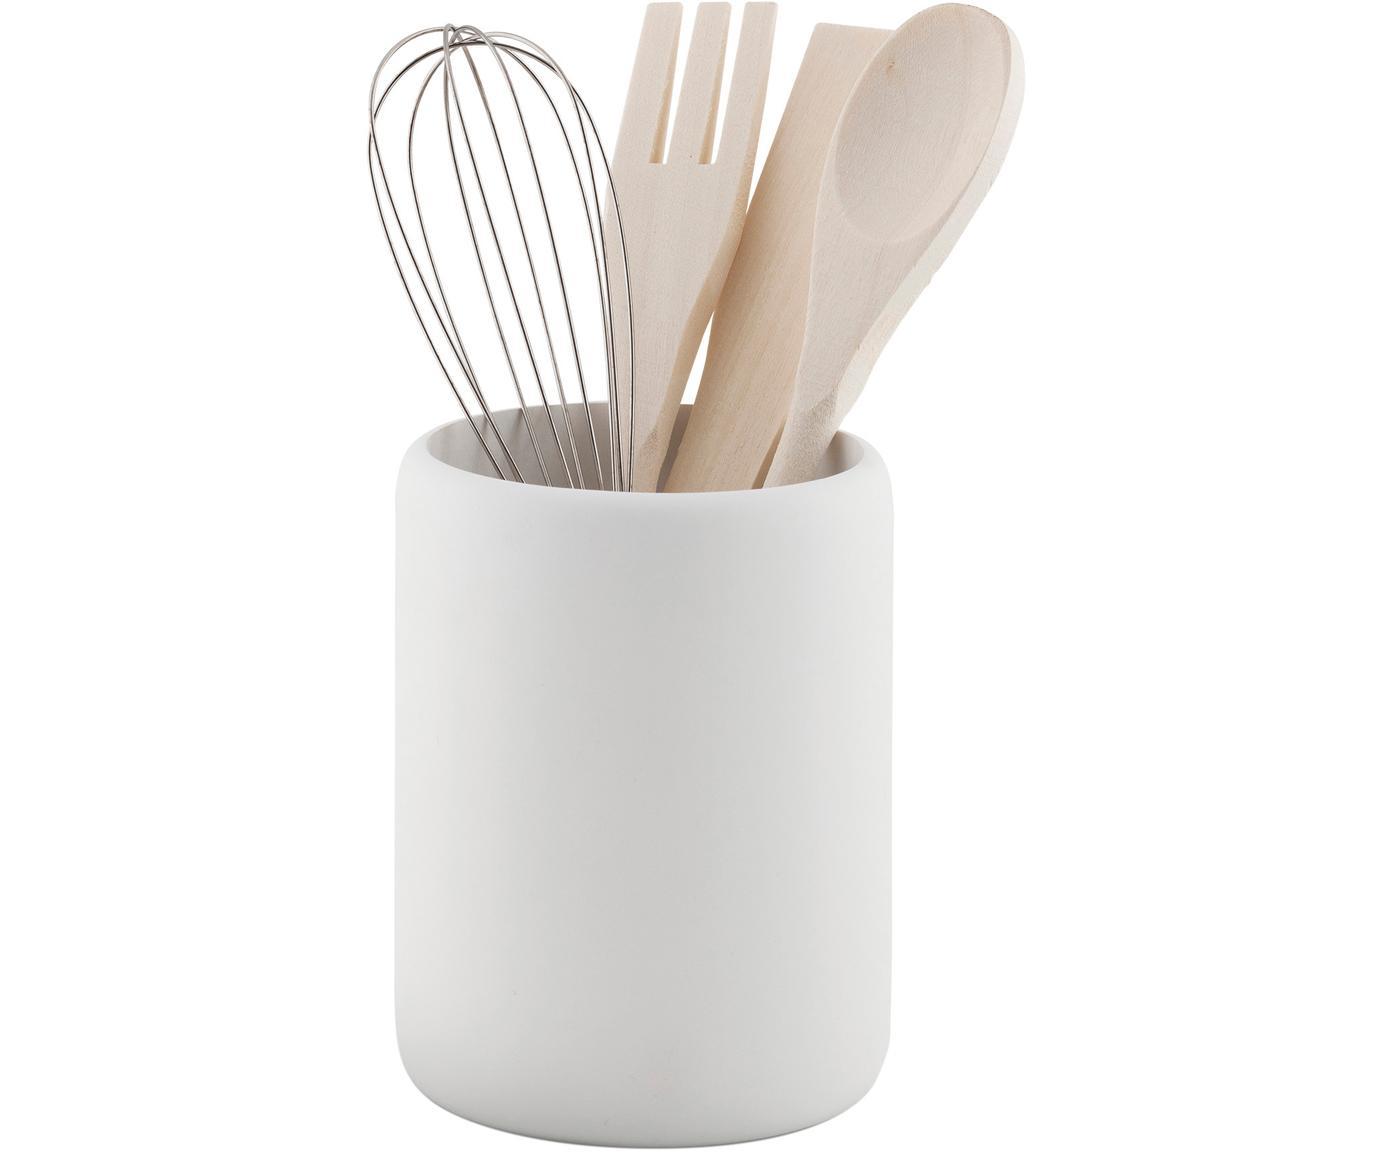 Set de utensilios de cocina Botta, 5pzas., Recipiente: poliresina, Blanco, madera, Ø 11 x Al 23 cm